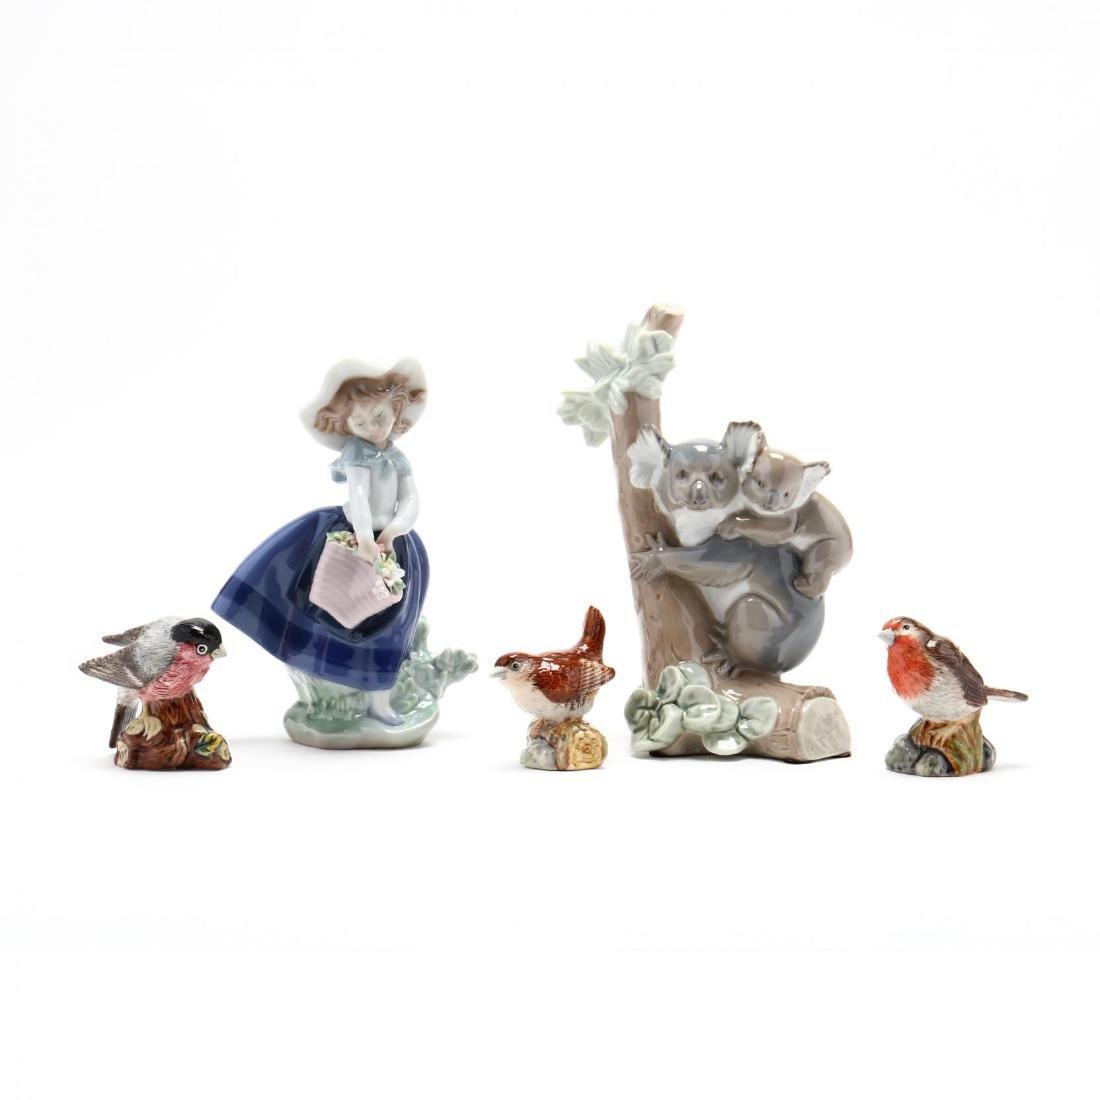 Five Porcelain Figures, Lladro and Royal Doulton - 2